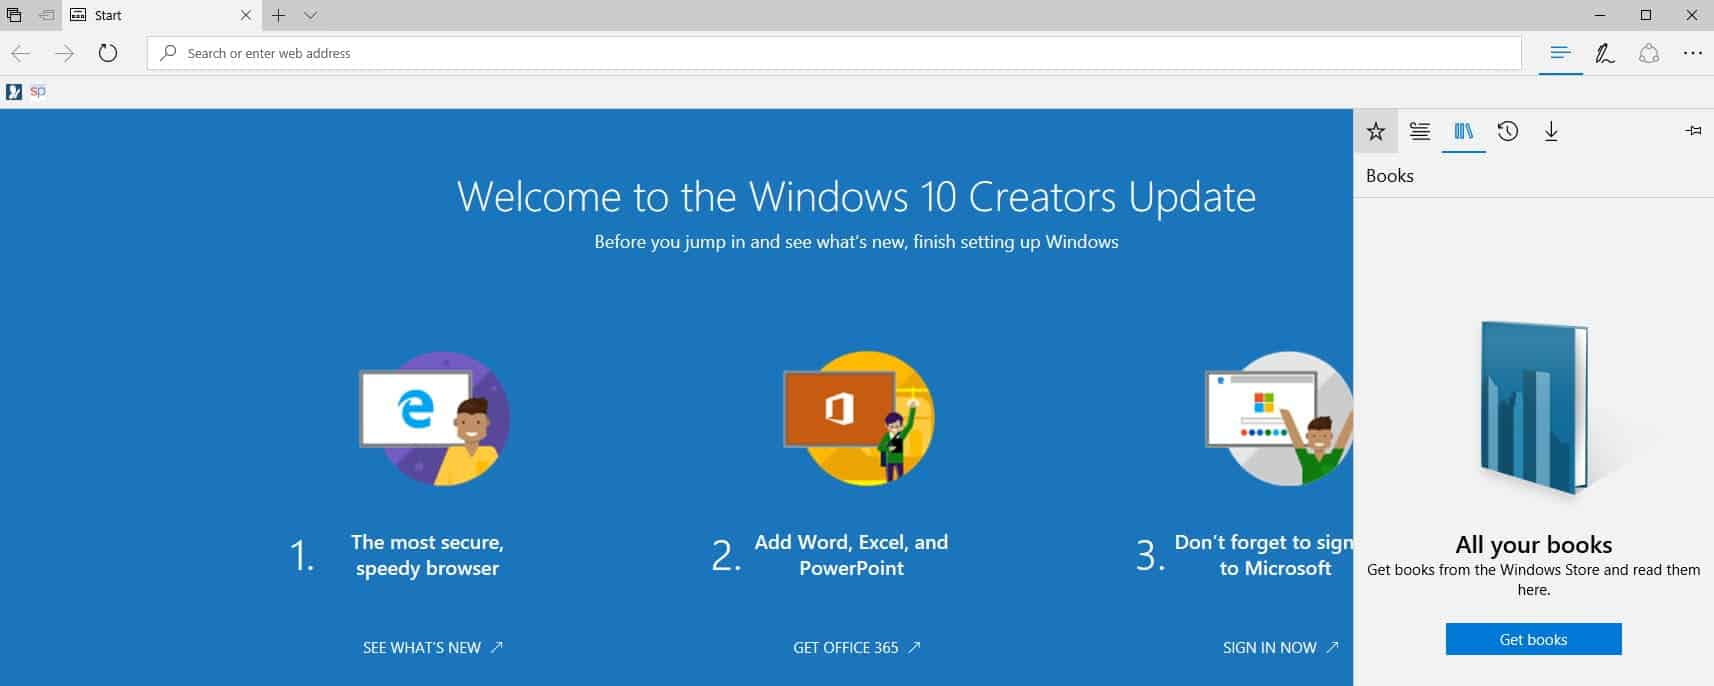 diskopprydding windows 10 som virker